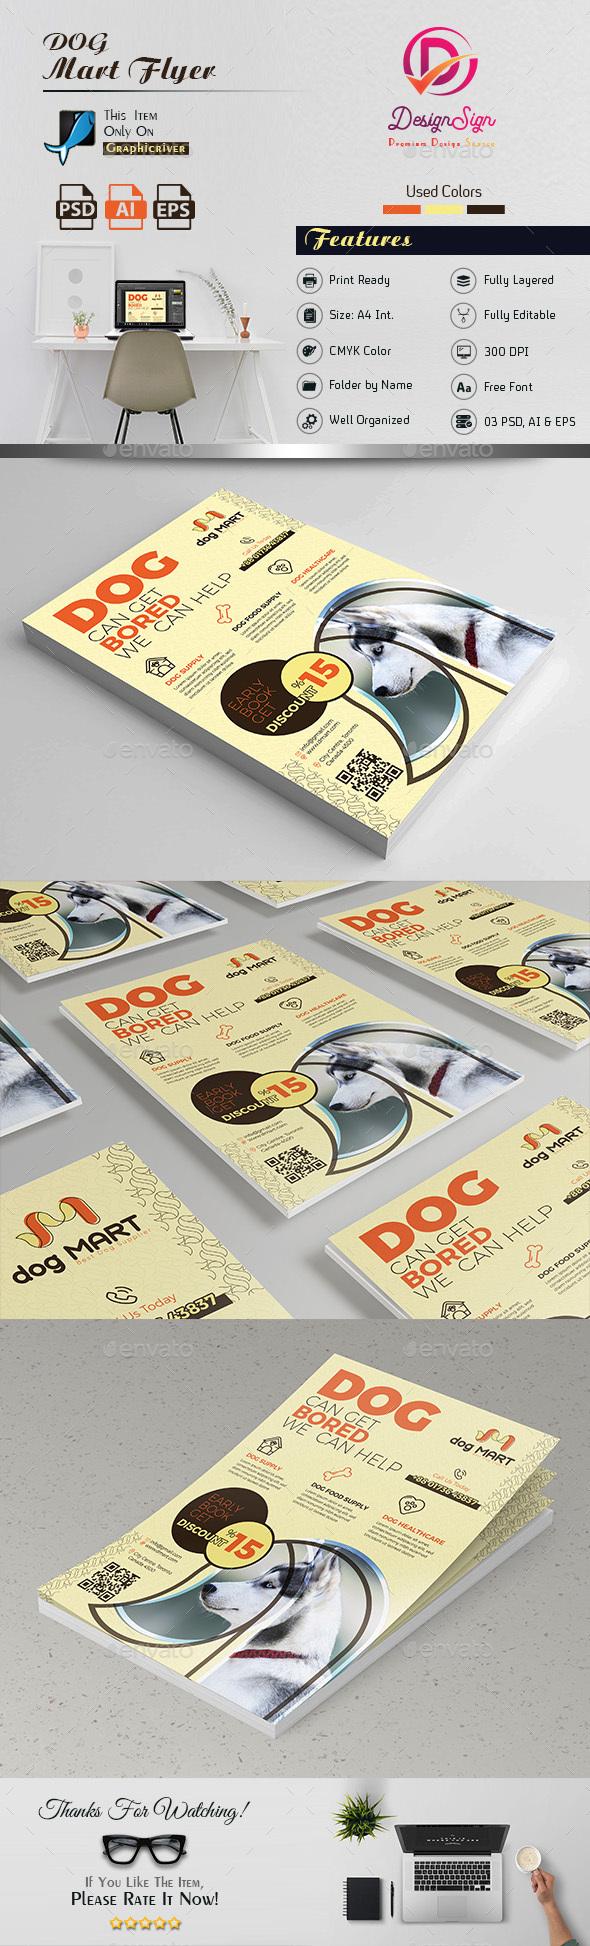 Dog Flyer - Commerce Flyers